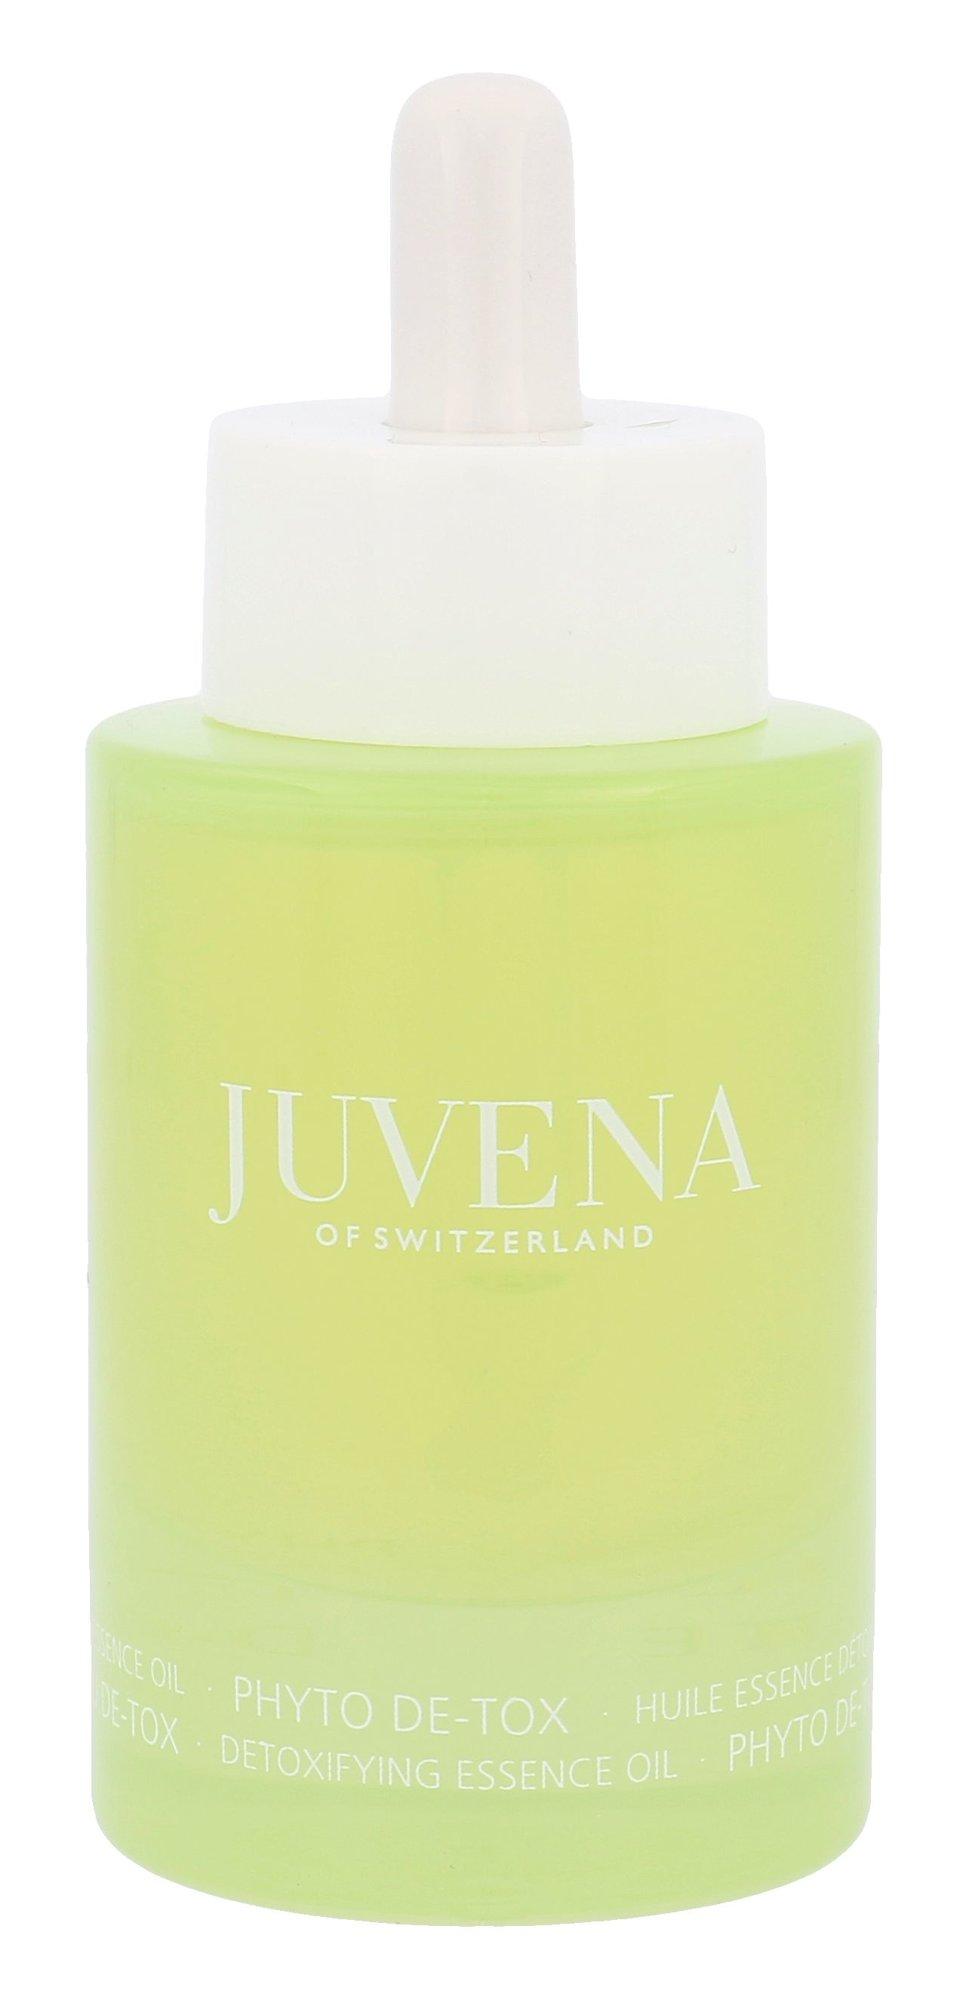 Juvena Juvena Phyto De Tox Essence Oil Cosmetic 50ml